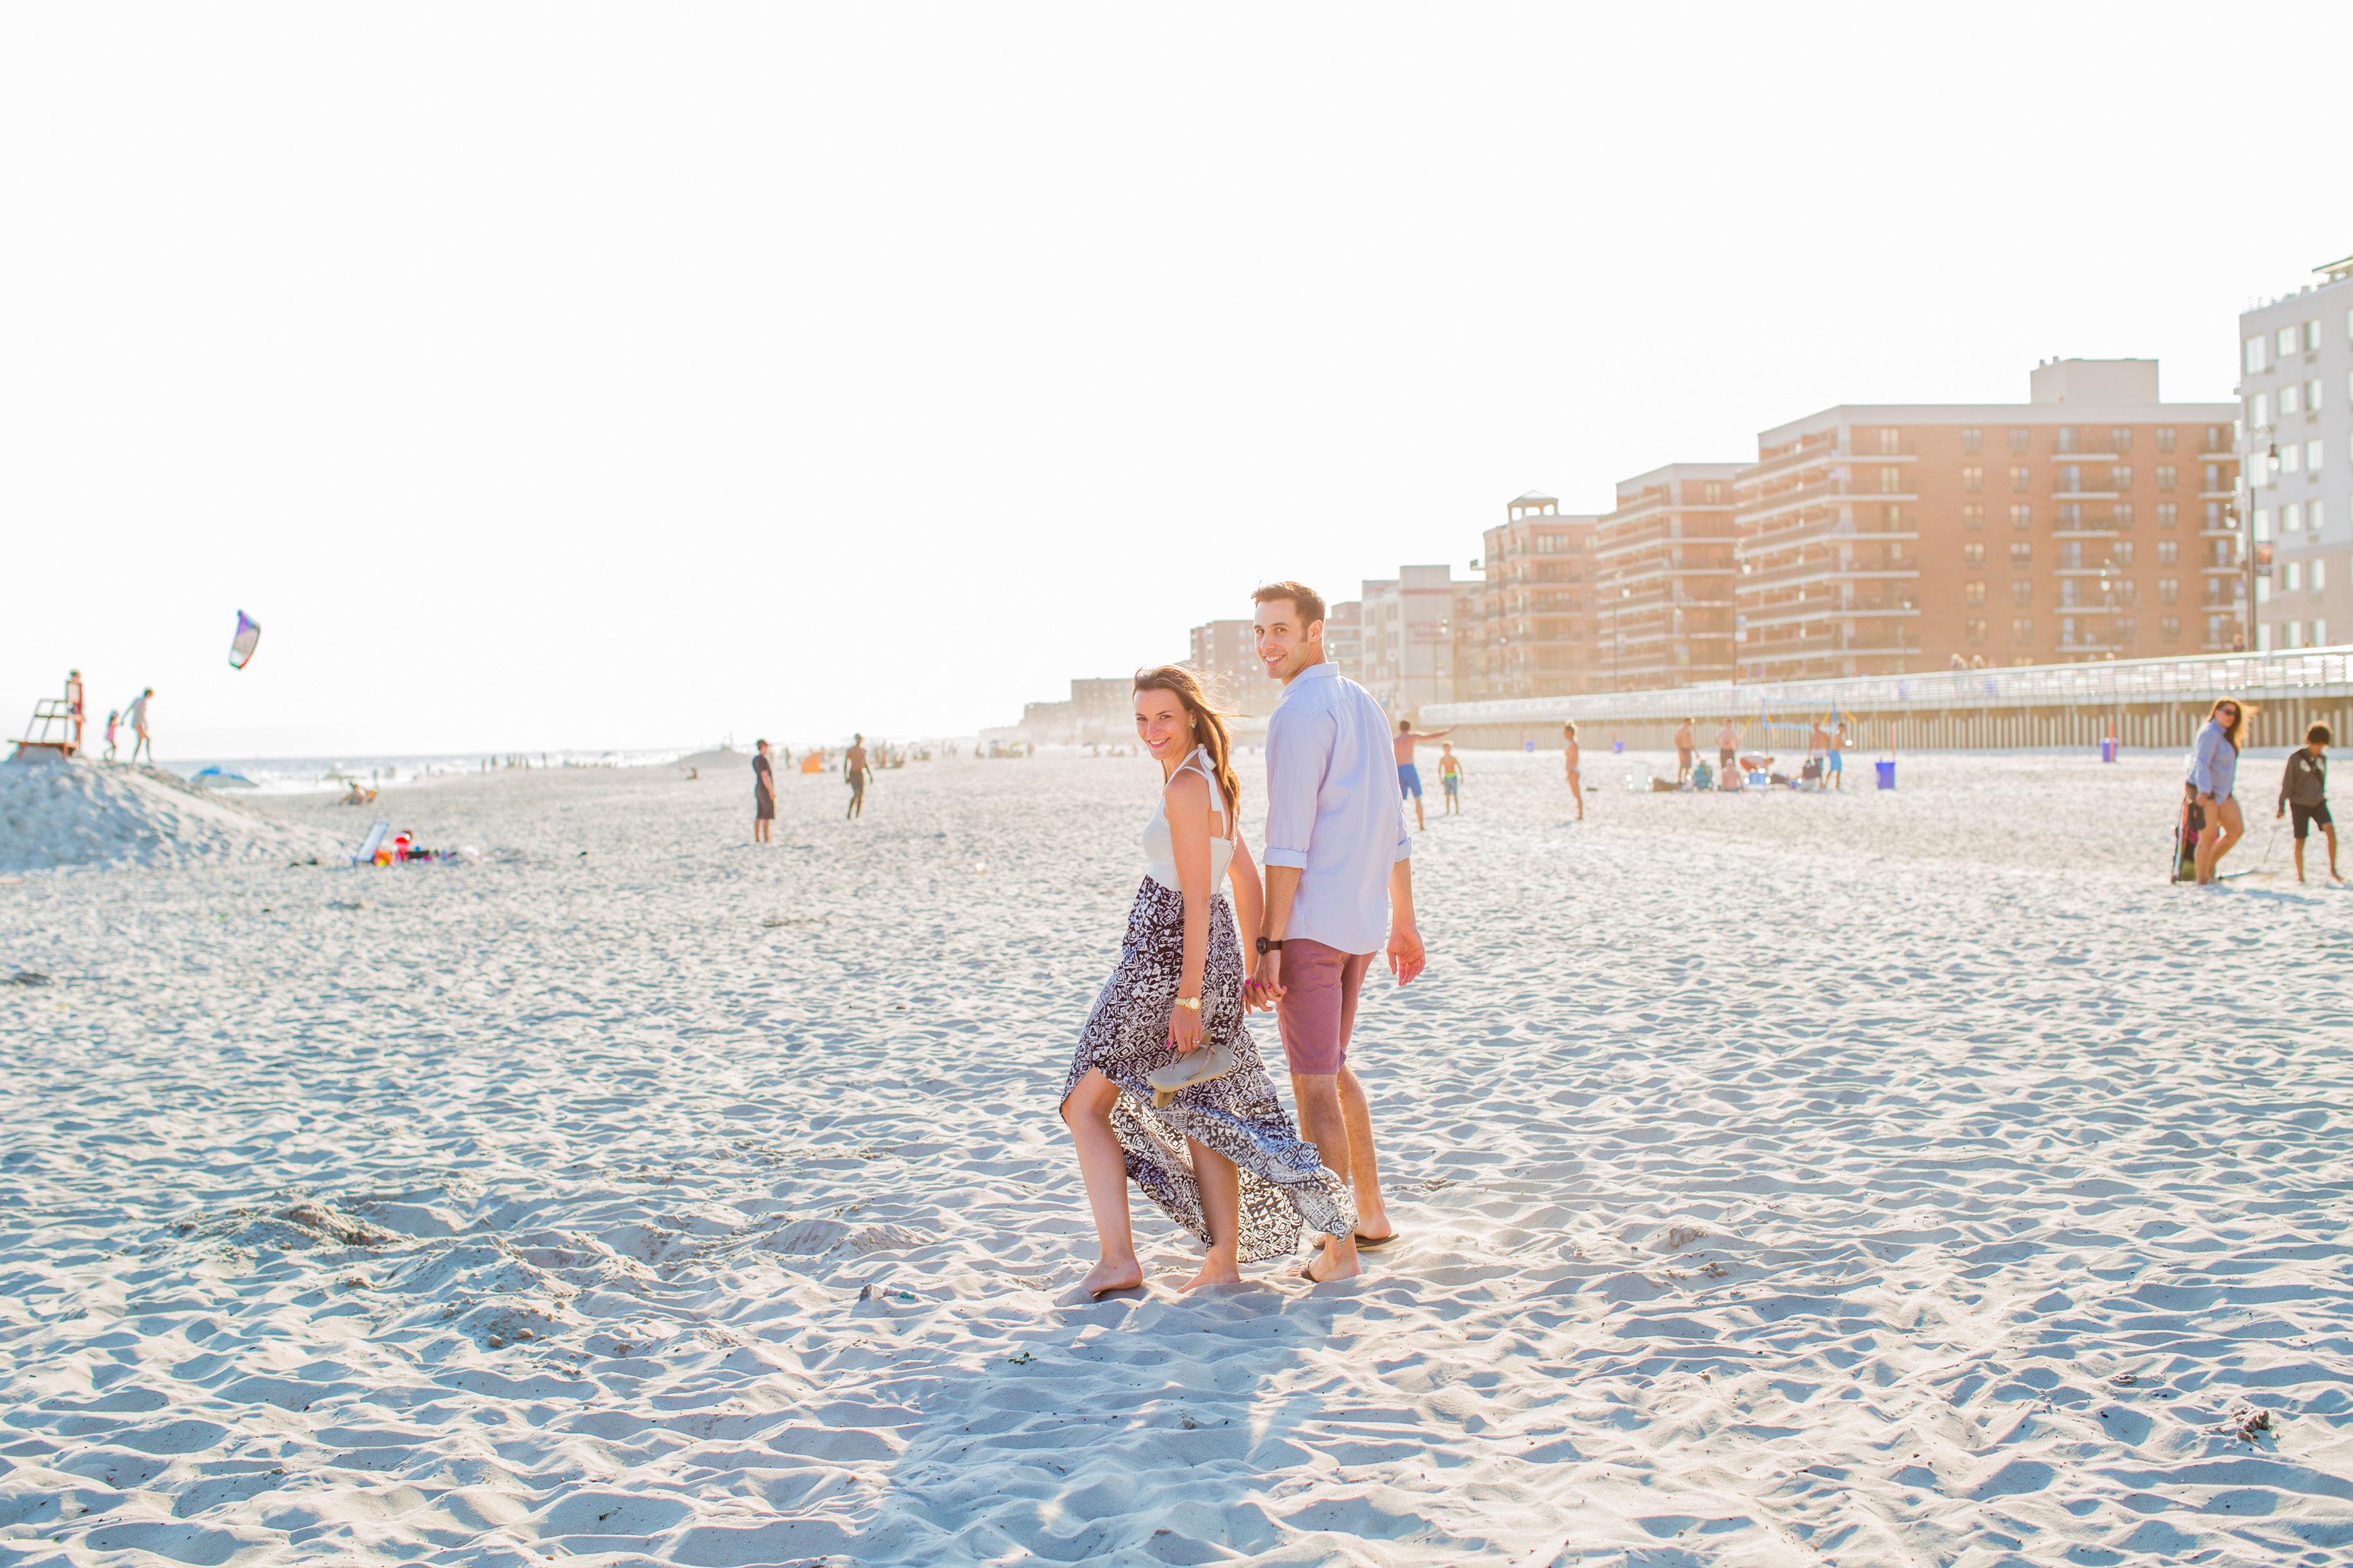 New york beach engagement session elizabeth anne designs for Beach weddings in ny